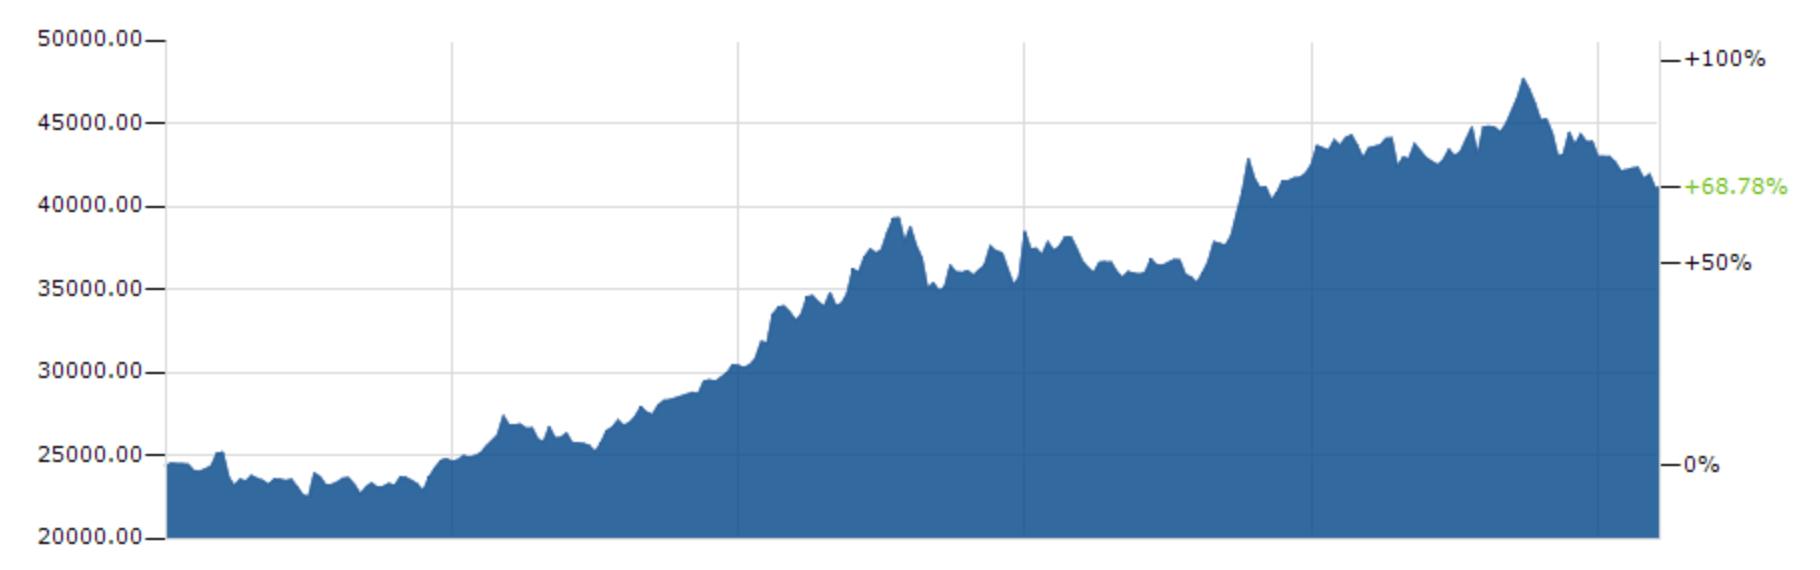 nintendo stock year over year